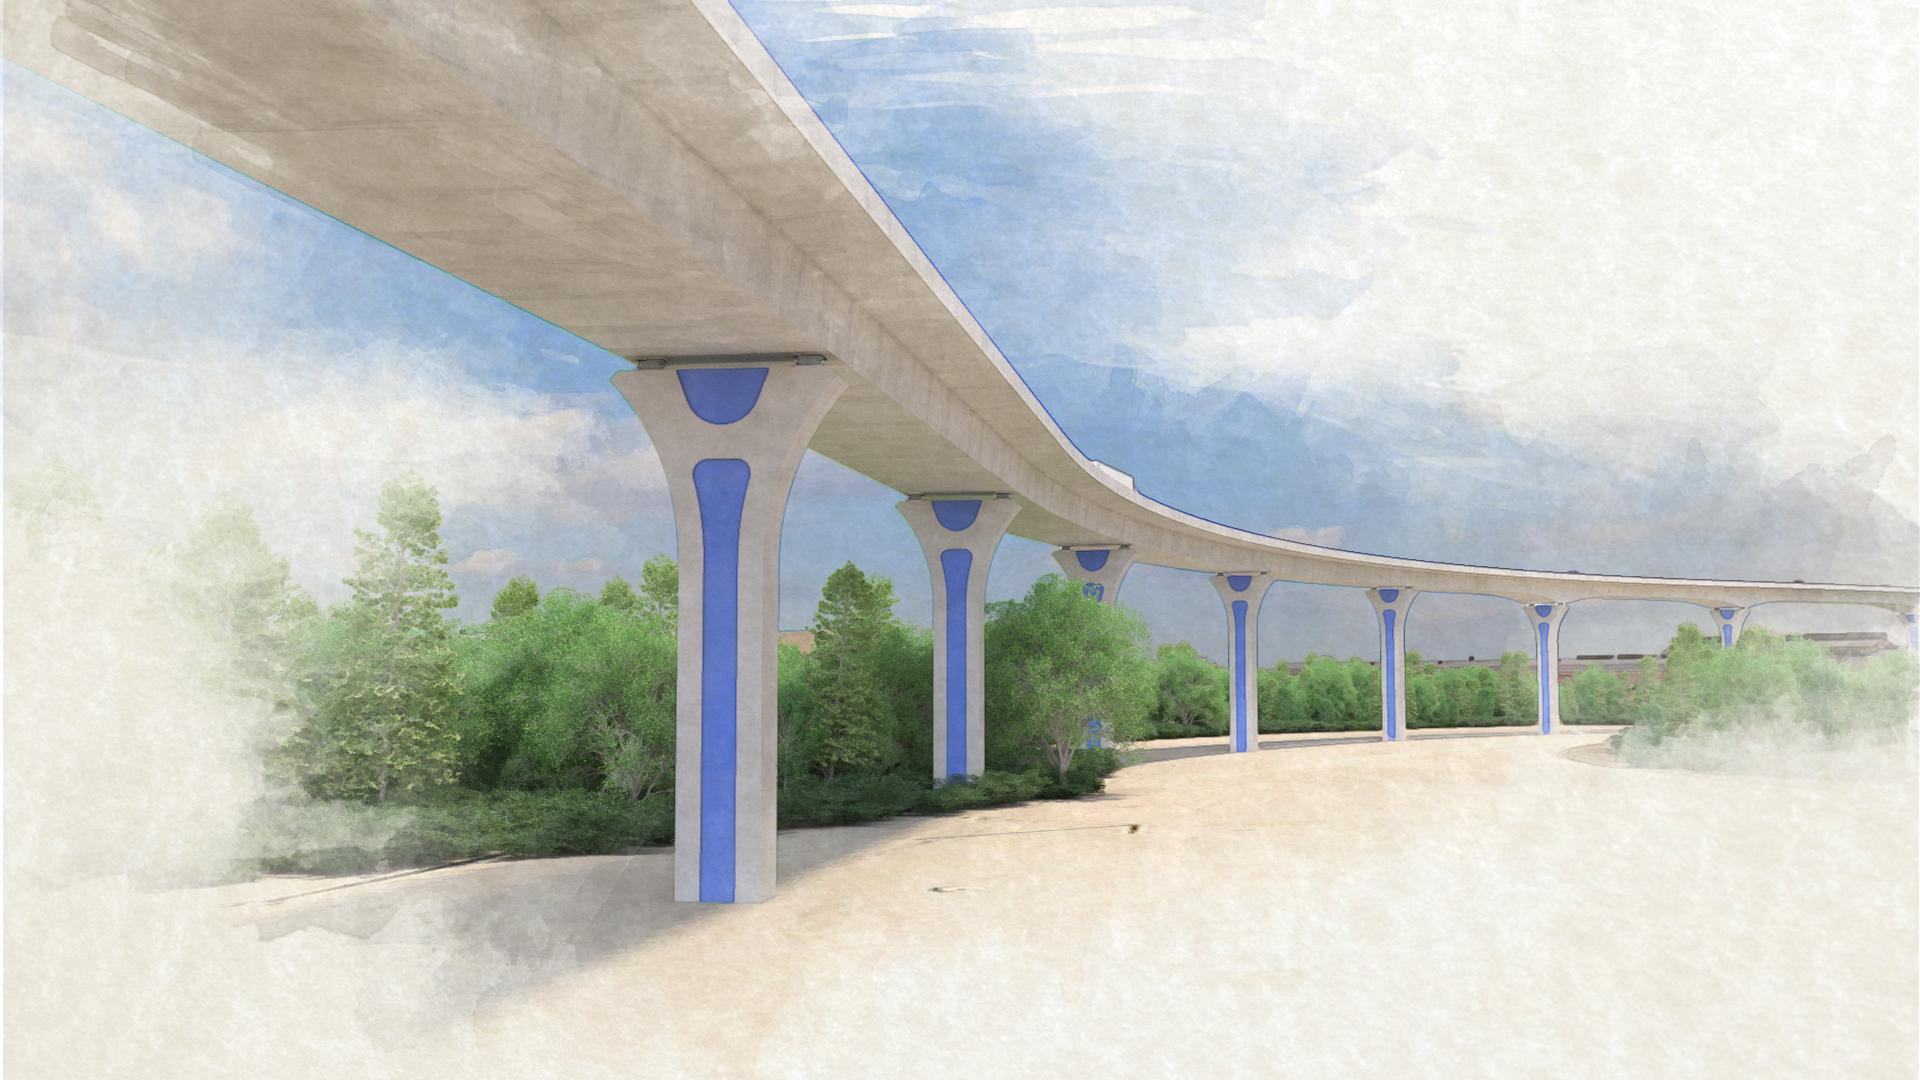 Cline Avenue Bridge – View 1